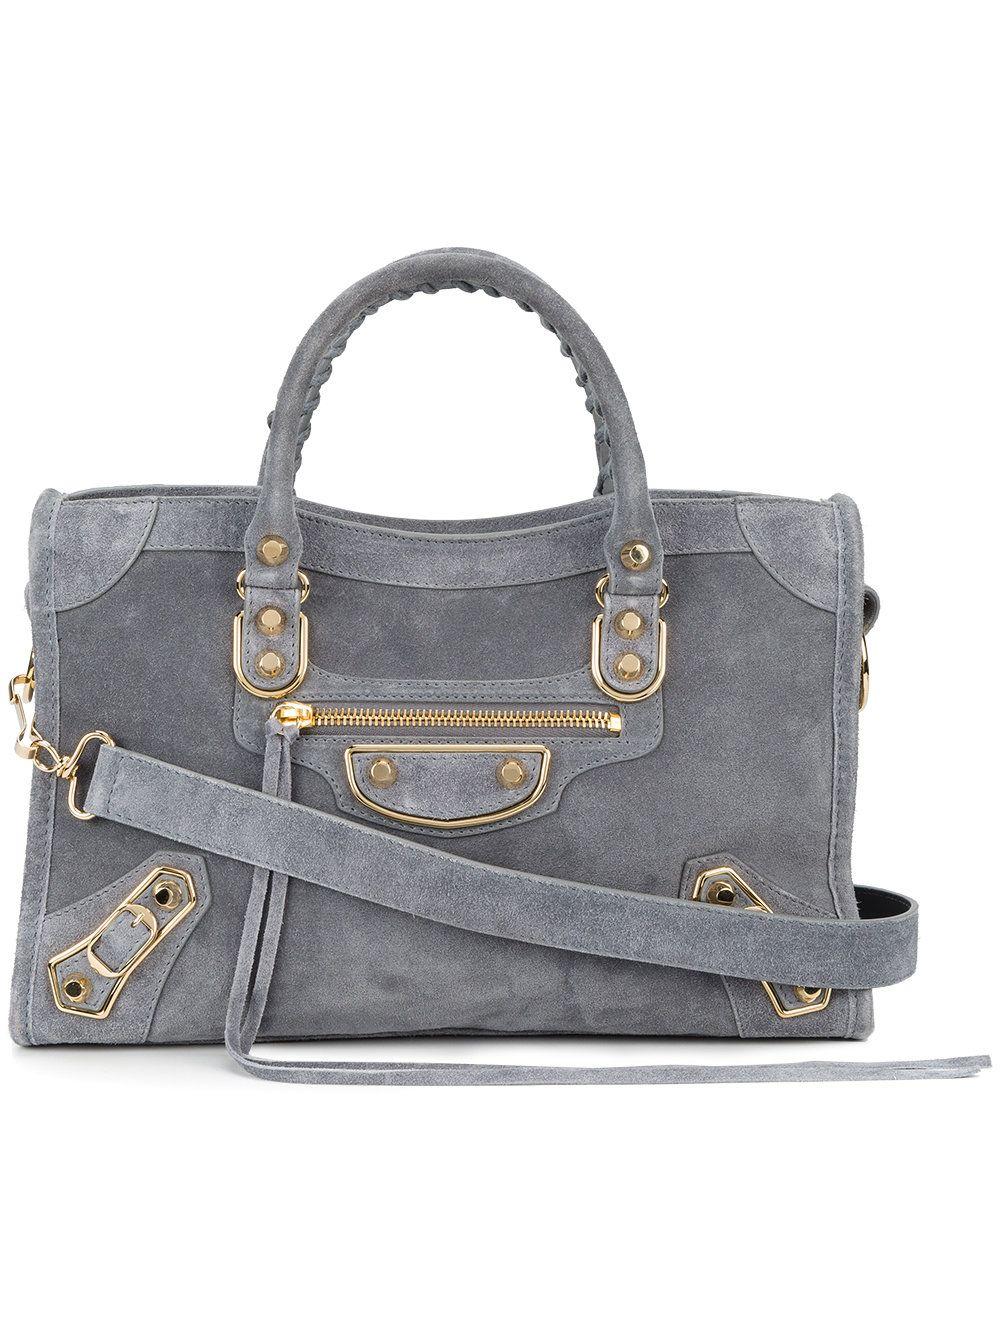 14678bffdb Pin by Nina Leah Josie on Handbags